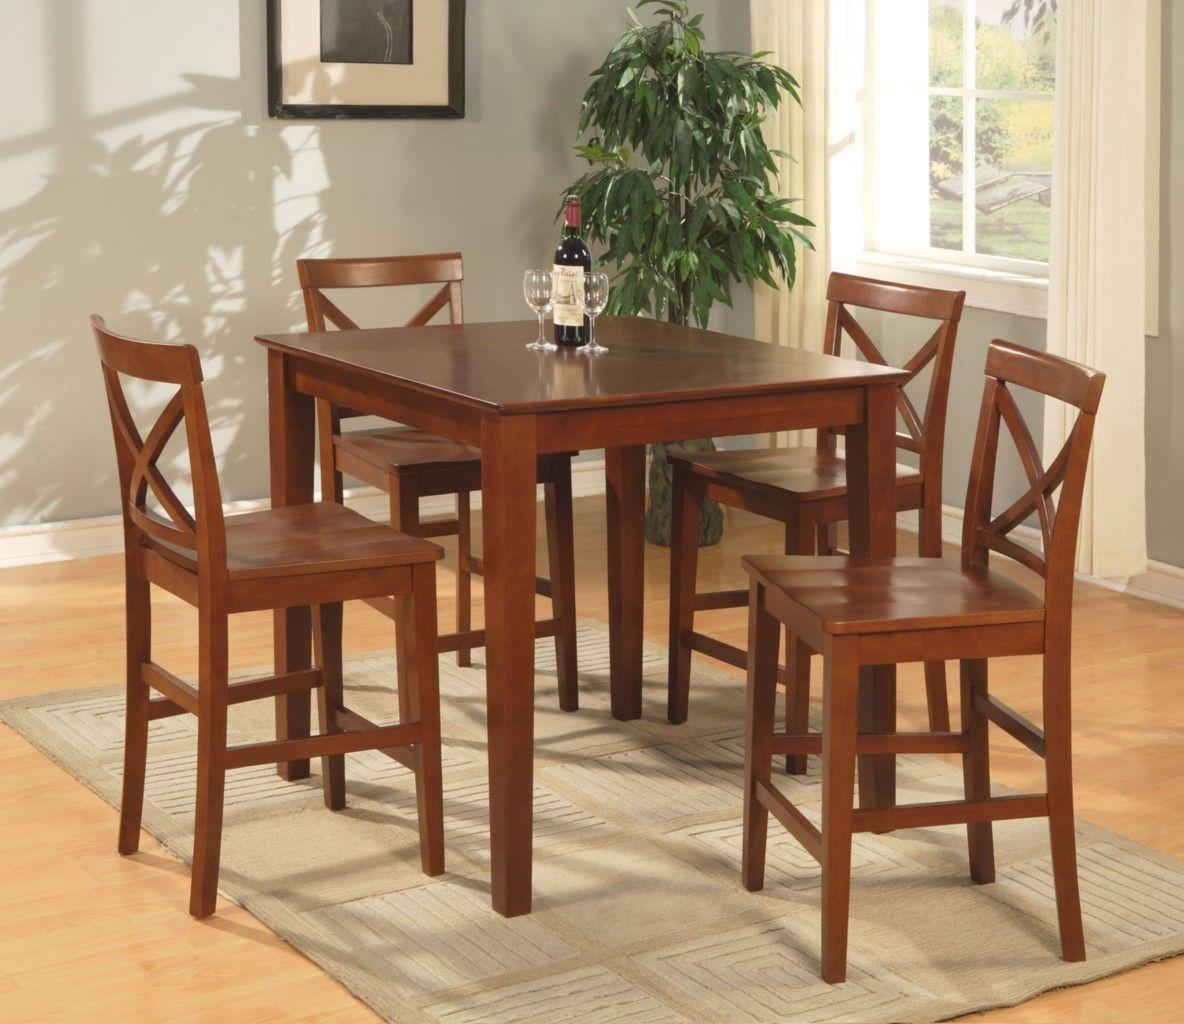 Oak Pub Style Kitchen Table